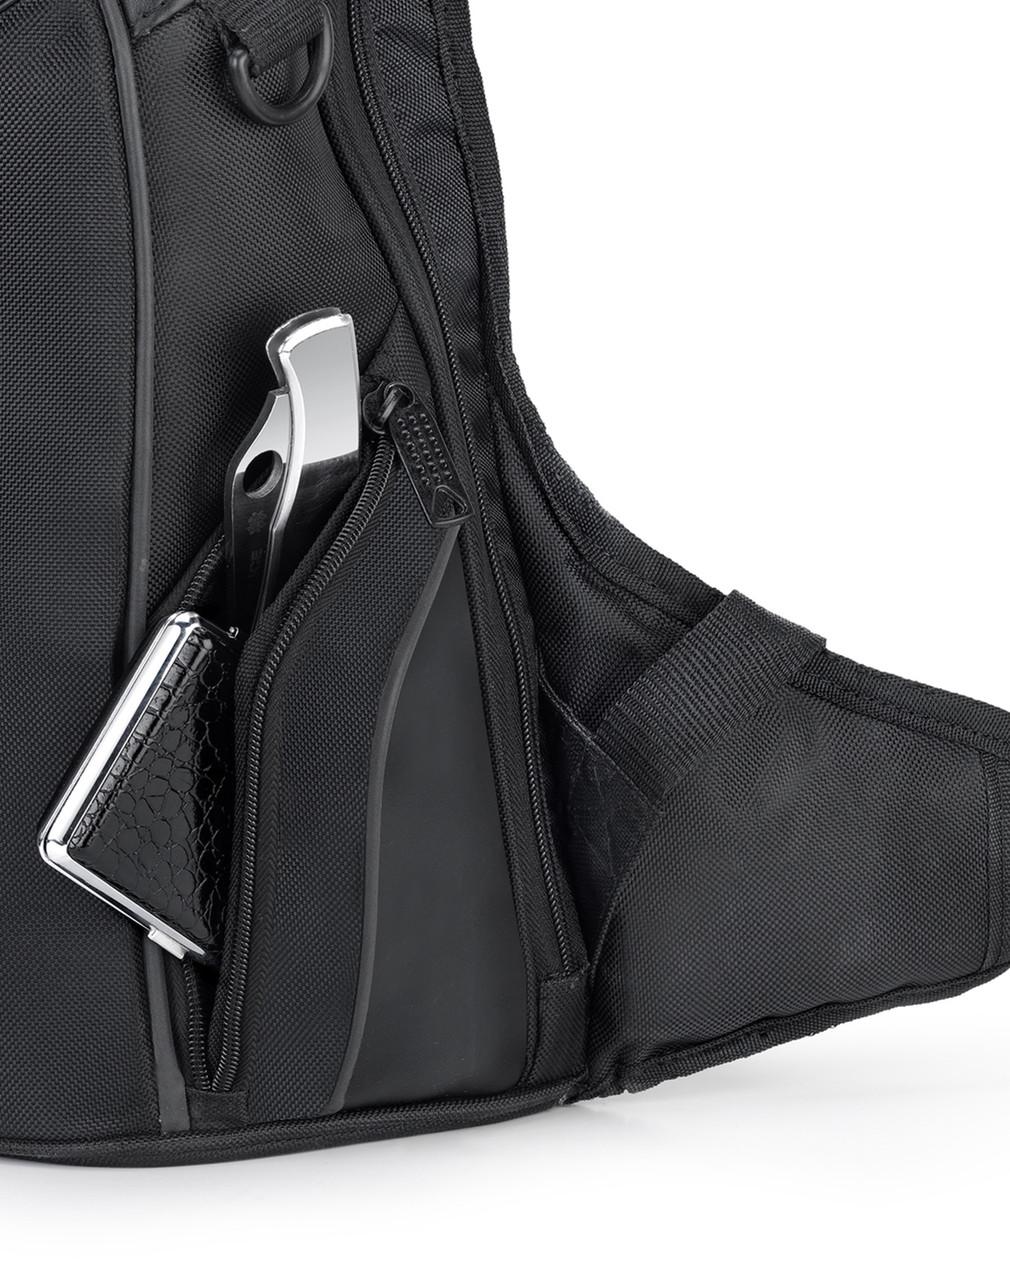 Honda Viking Motorcycle Medium Backpack Front Pocket